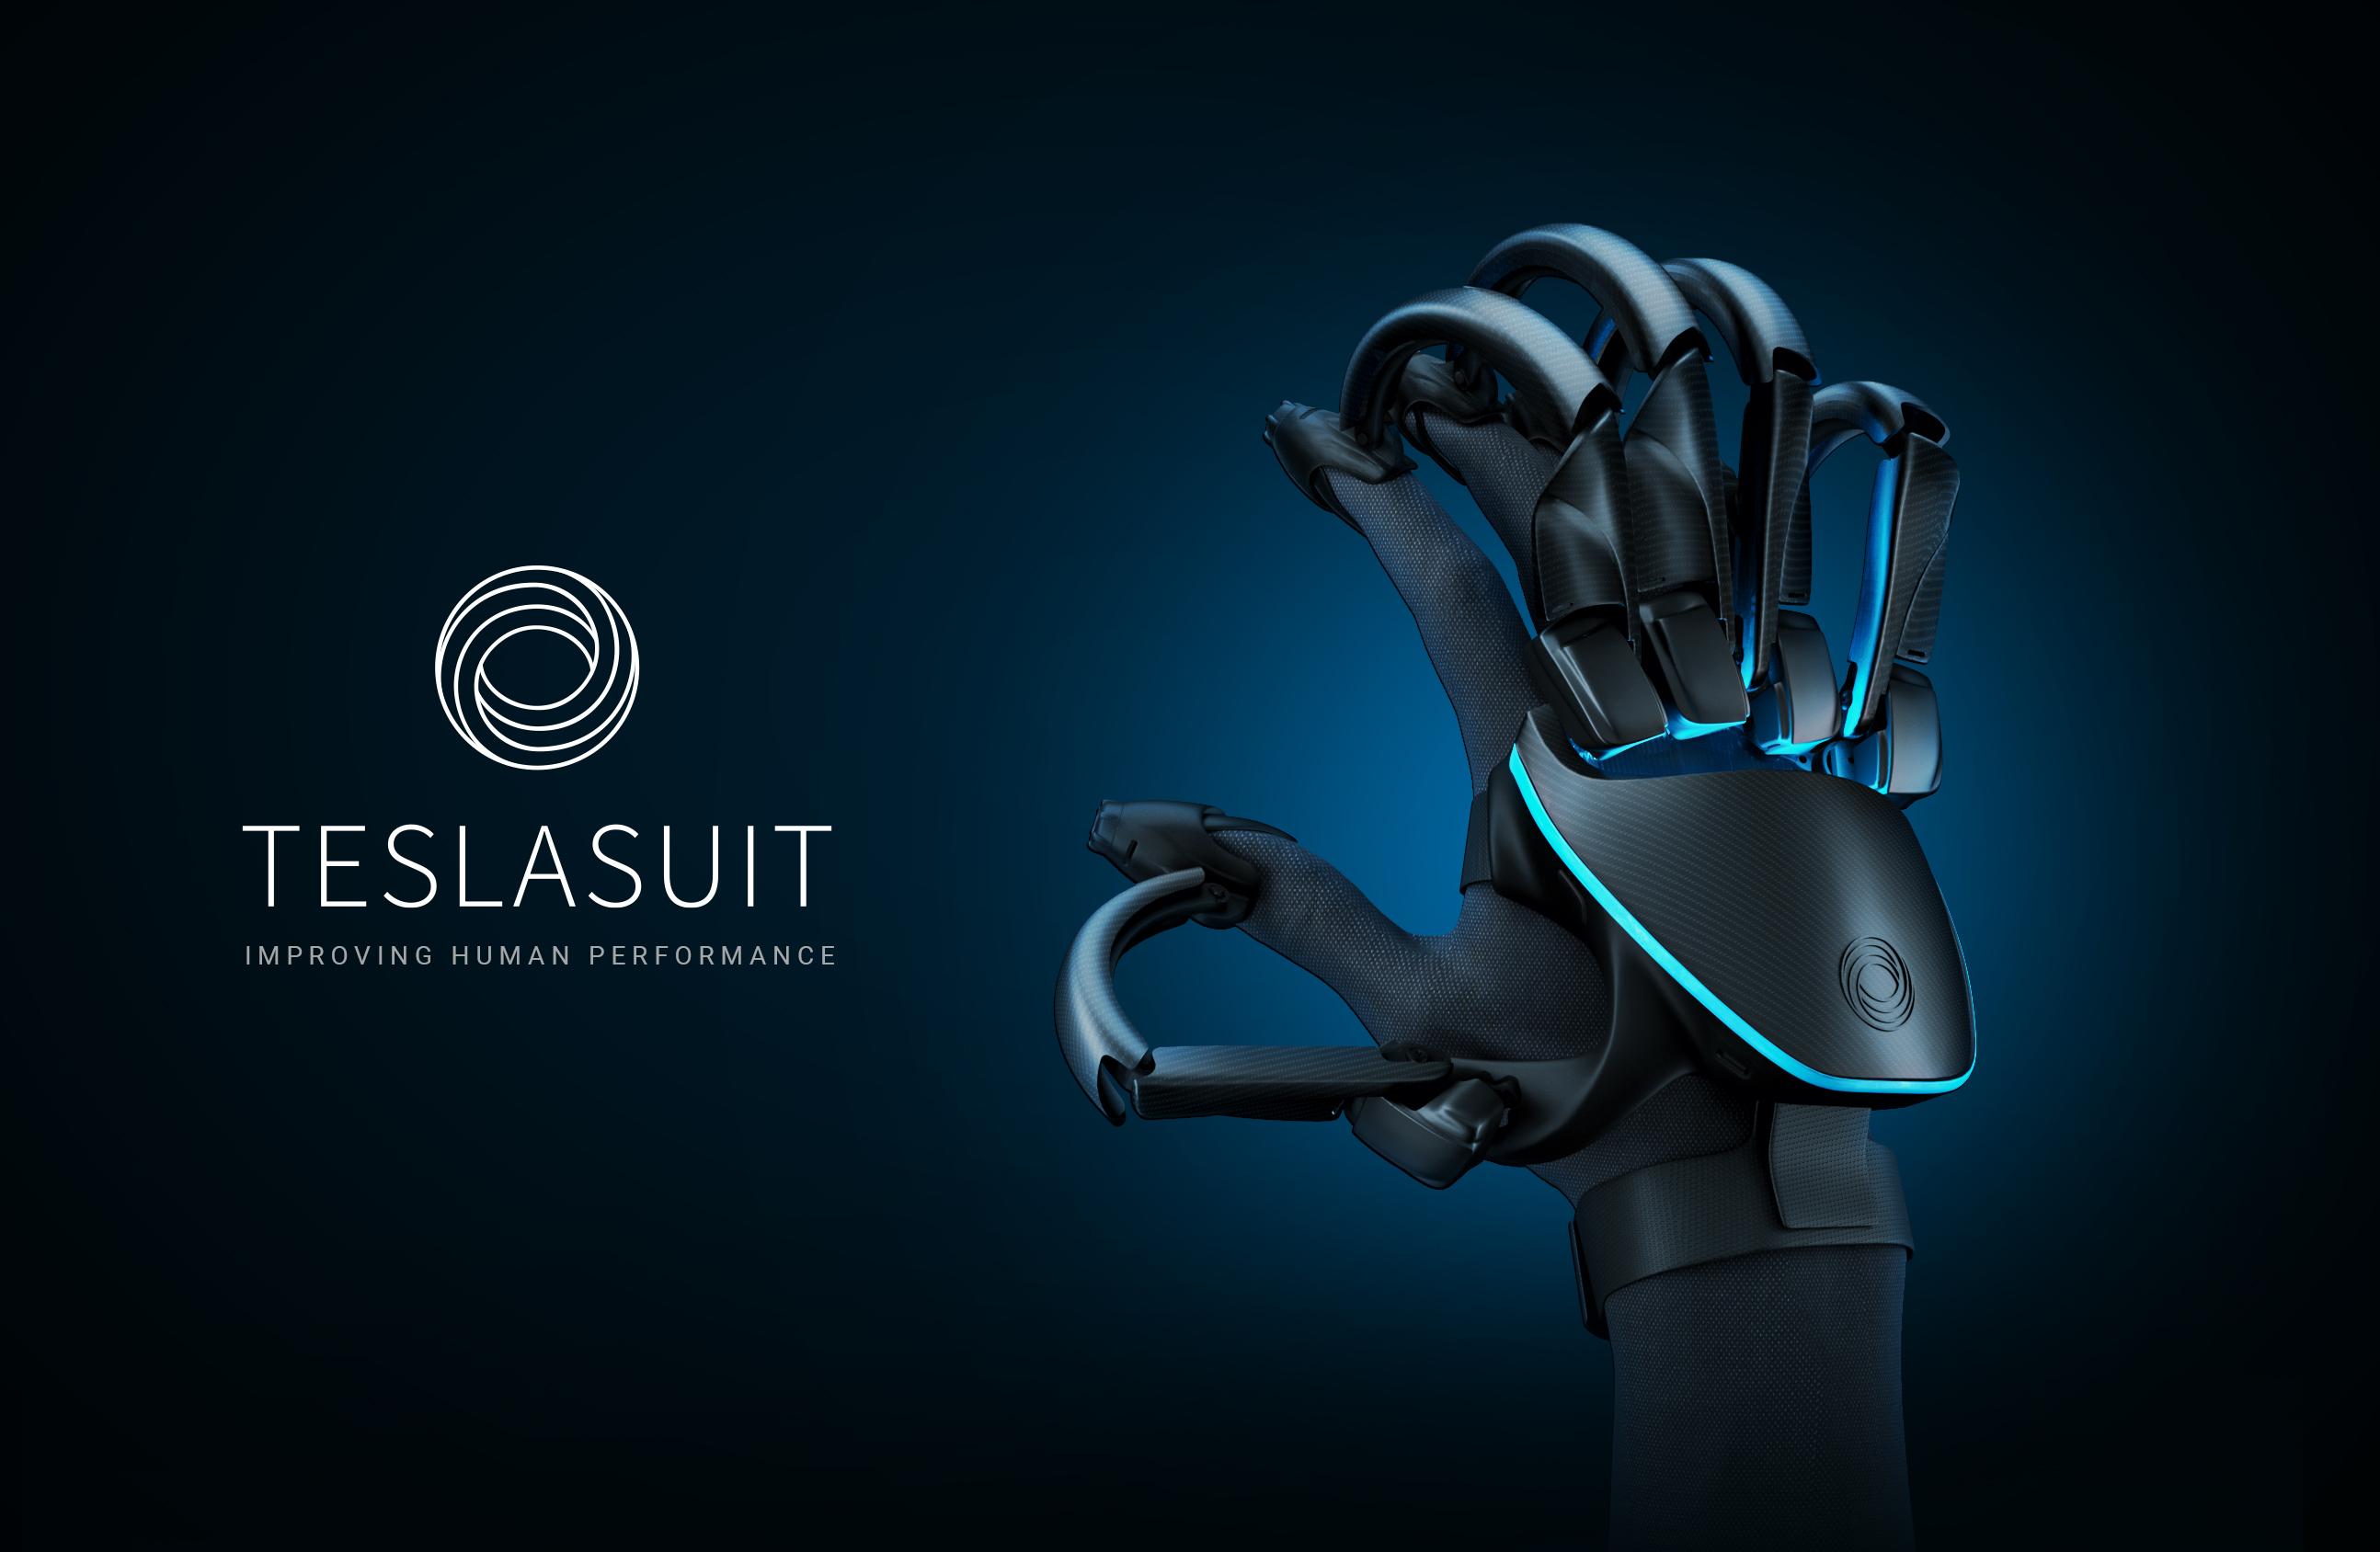 Teslasuit Product Image